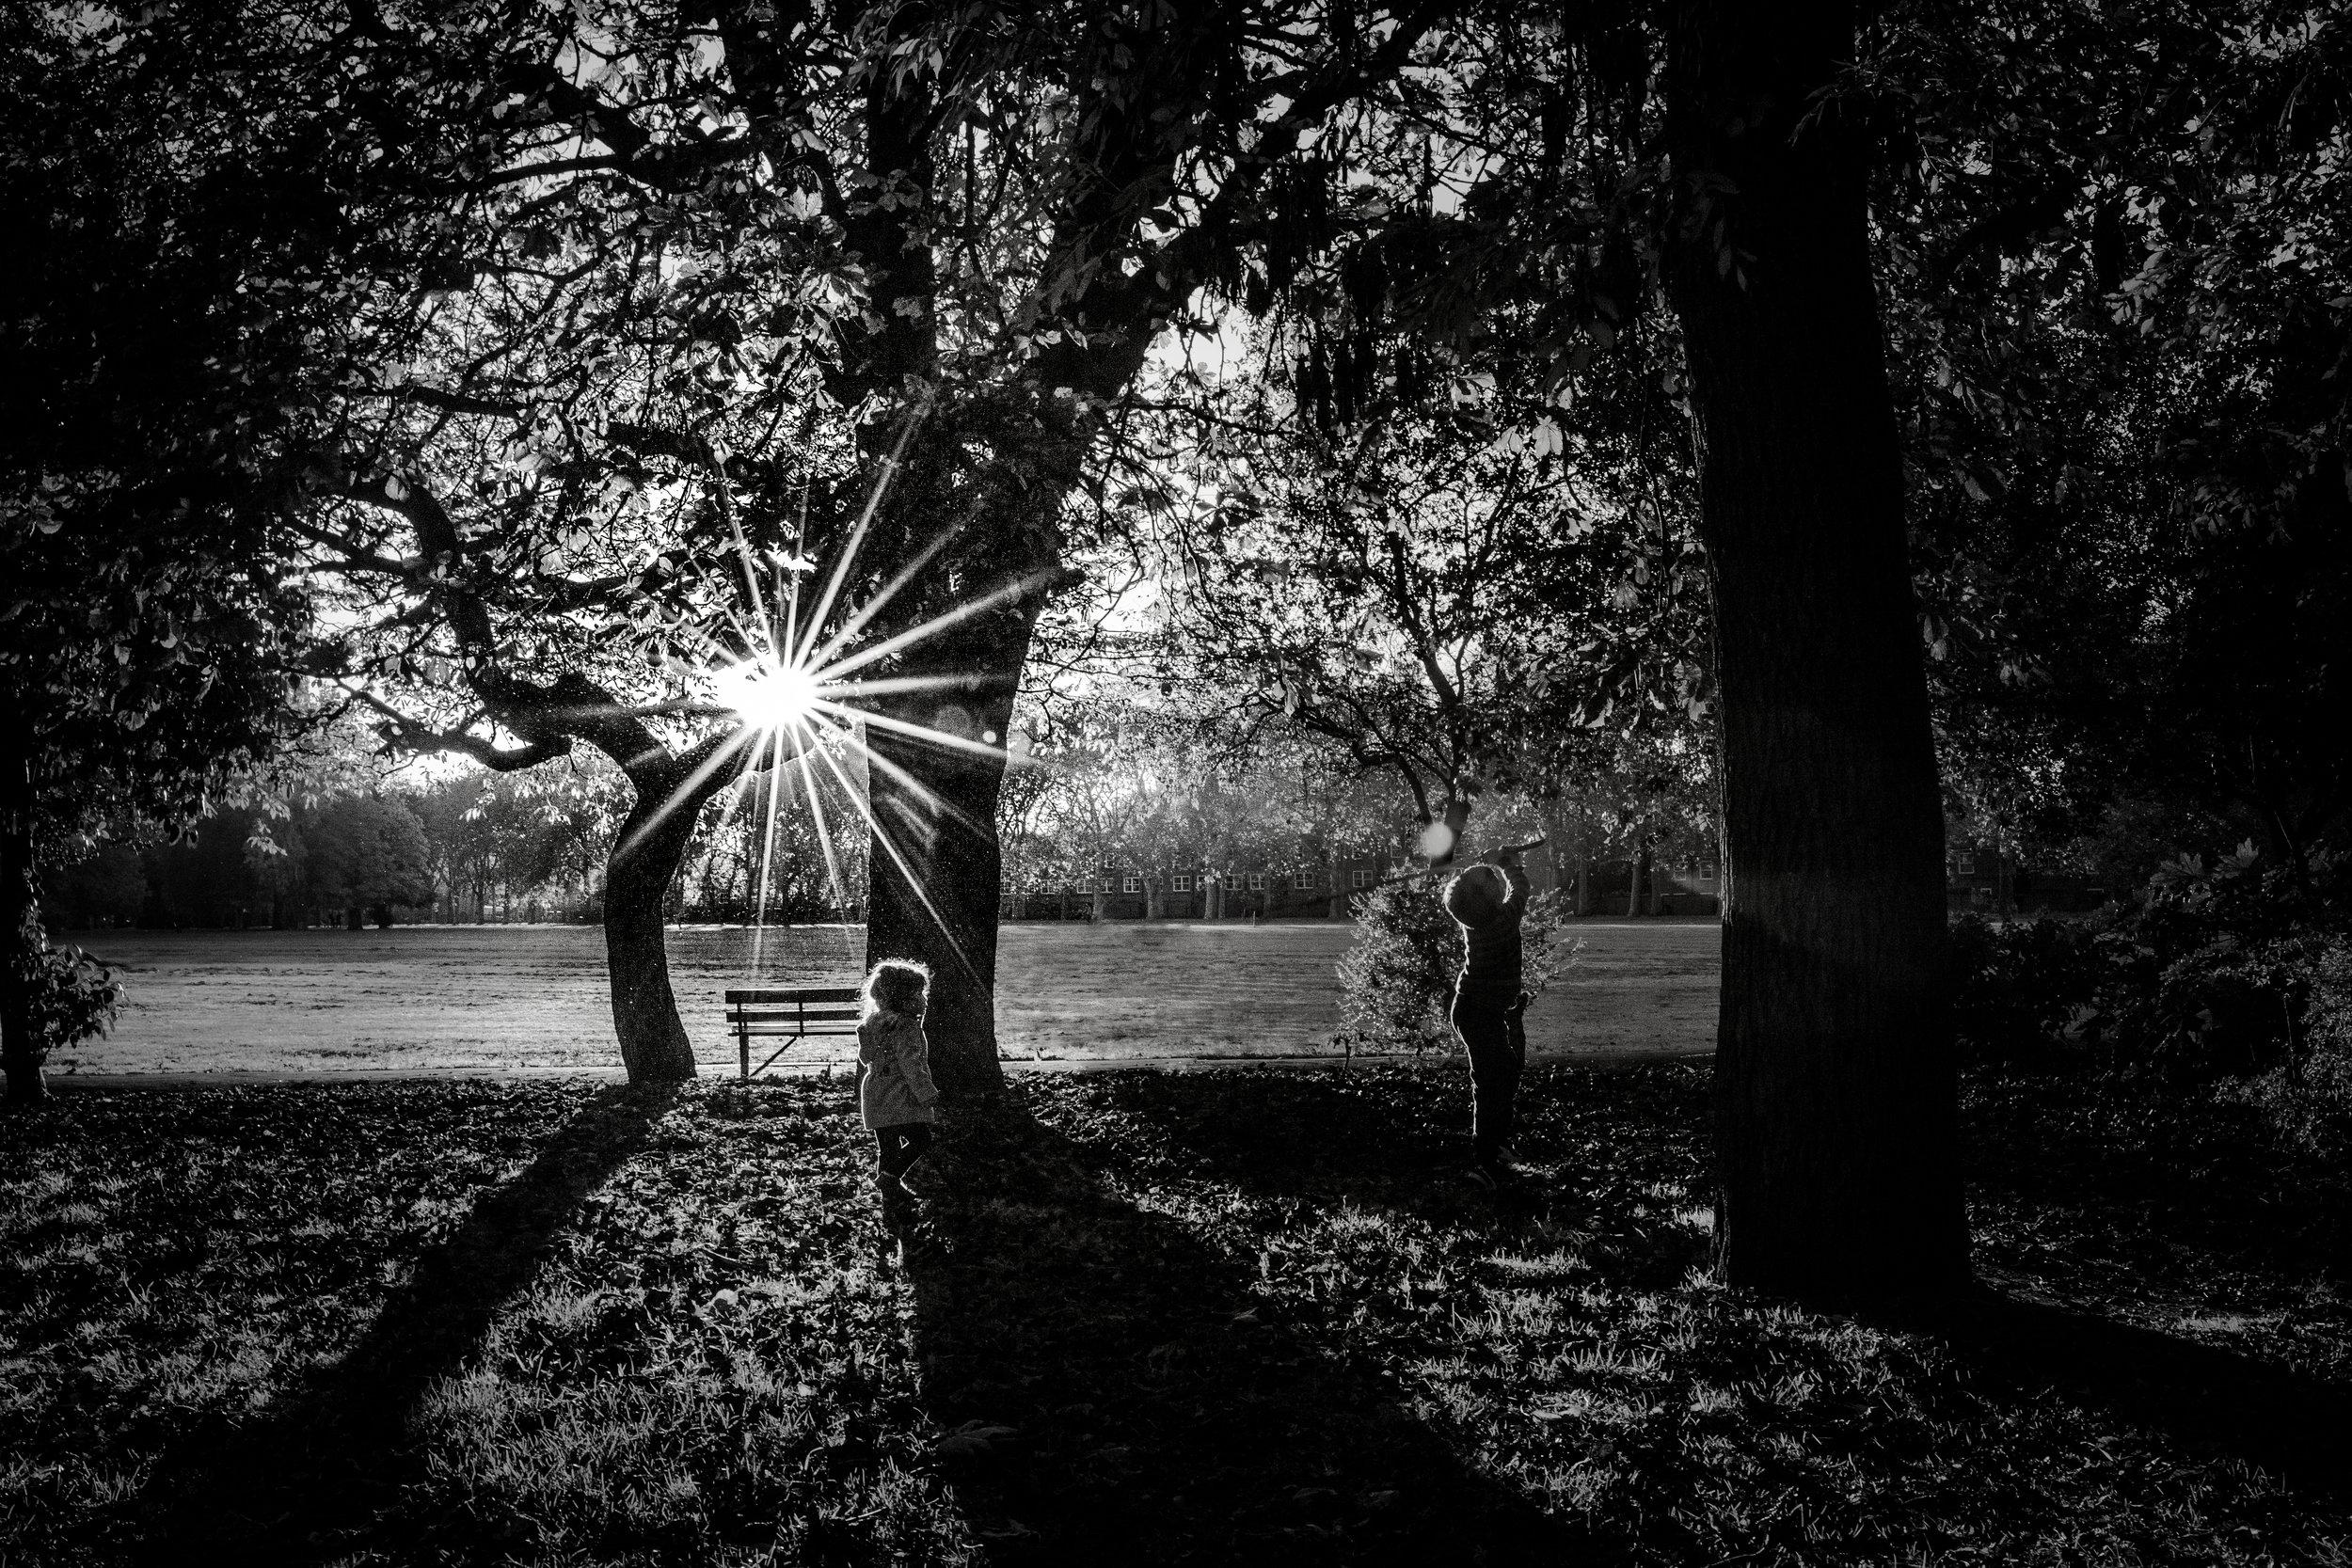 Sunflair Victoria Park Autumn 06.jpg